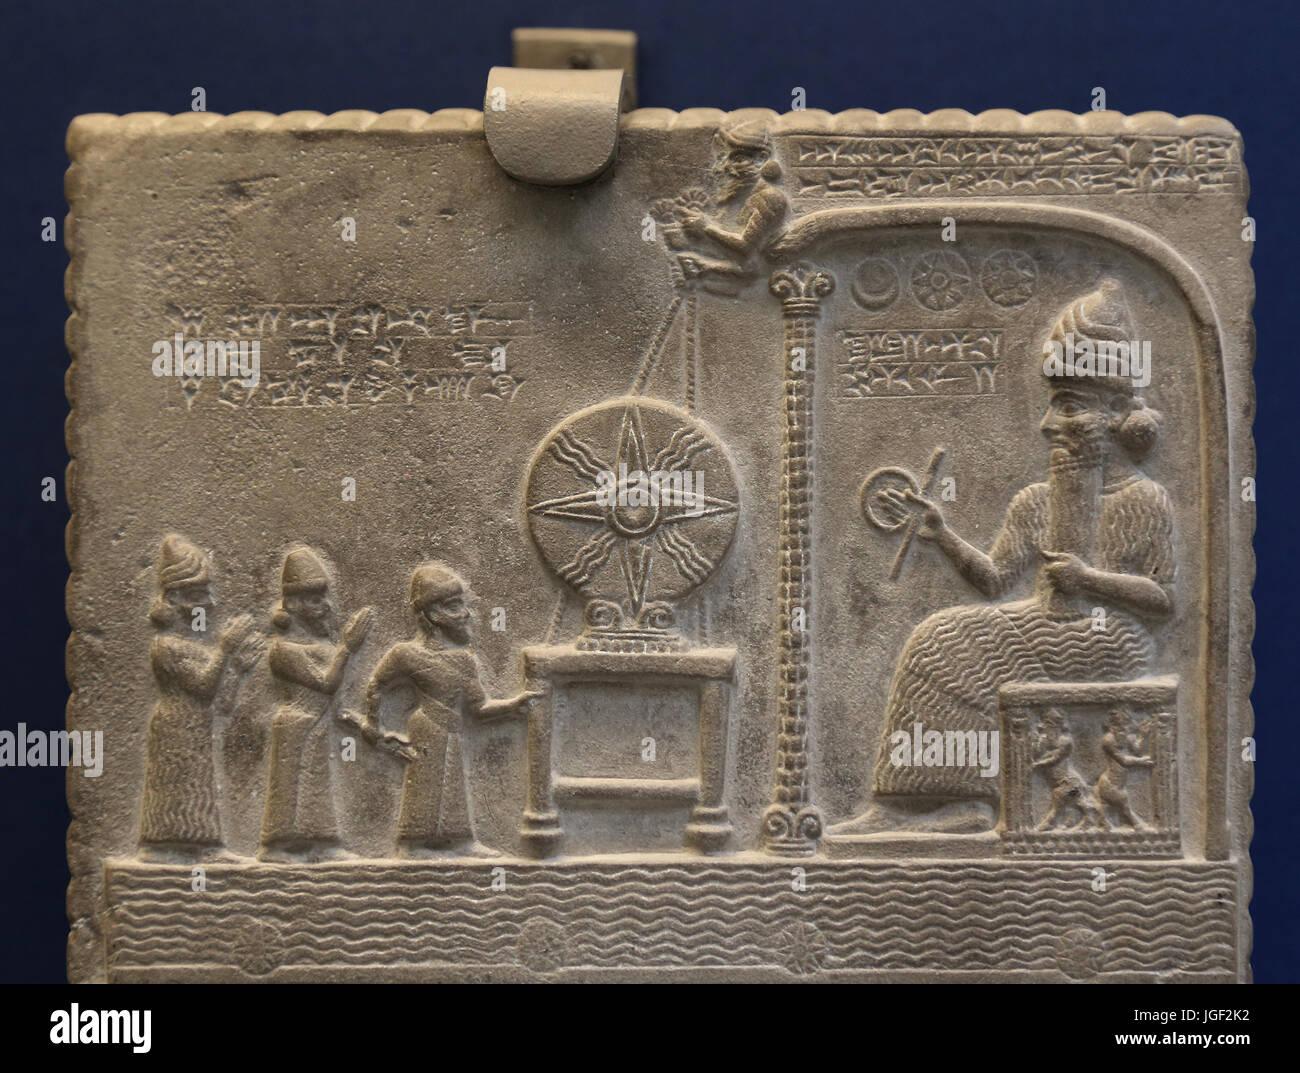 Sun God tablet. King Nabu-apla-iddina celebrates installation statue of Shamash god. 860-850 BC. Sippar, Iraq. British - Stock Image